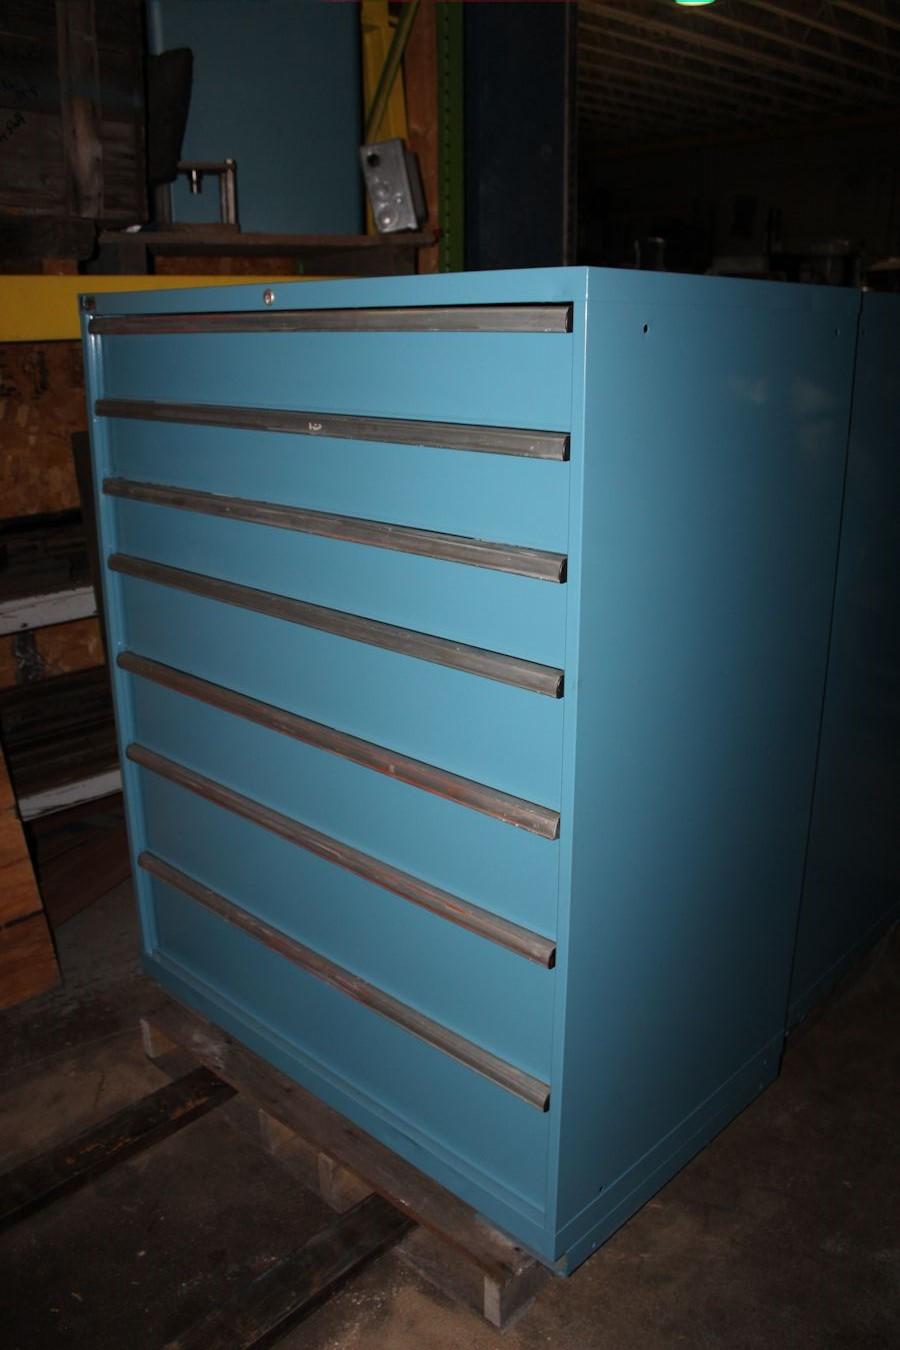 cabinets storage advanced of introduces cabinet with mini edgarpoenet mezzanine lista gallery canada